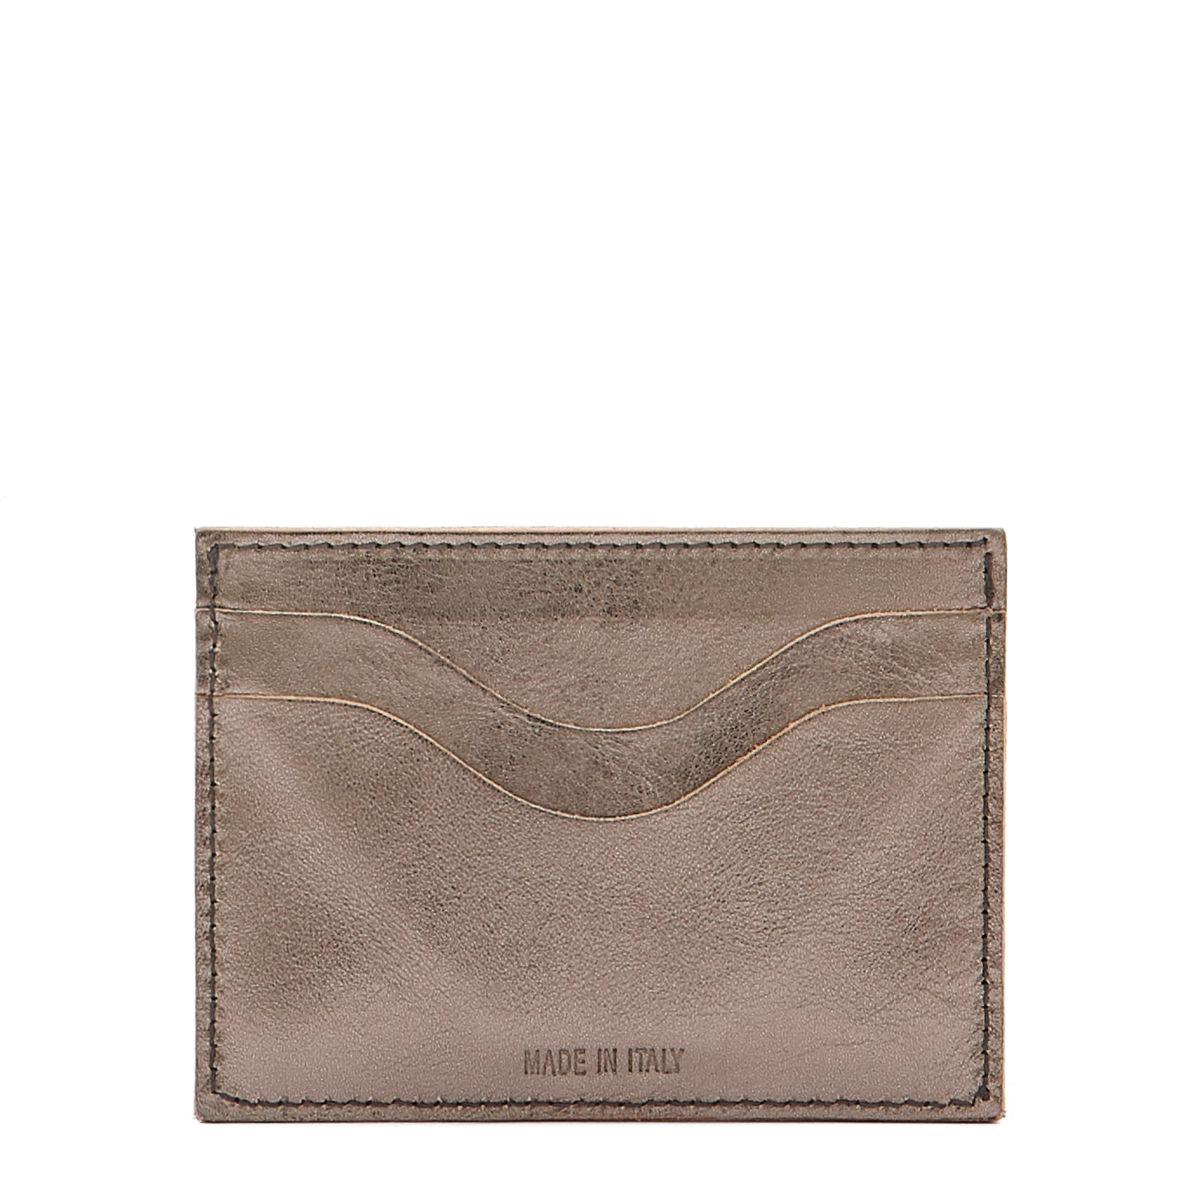 Card Case Salina in Metallic Leather SCC050 color Metallic Bronze | Details